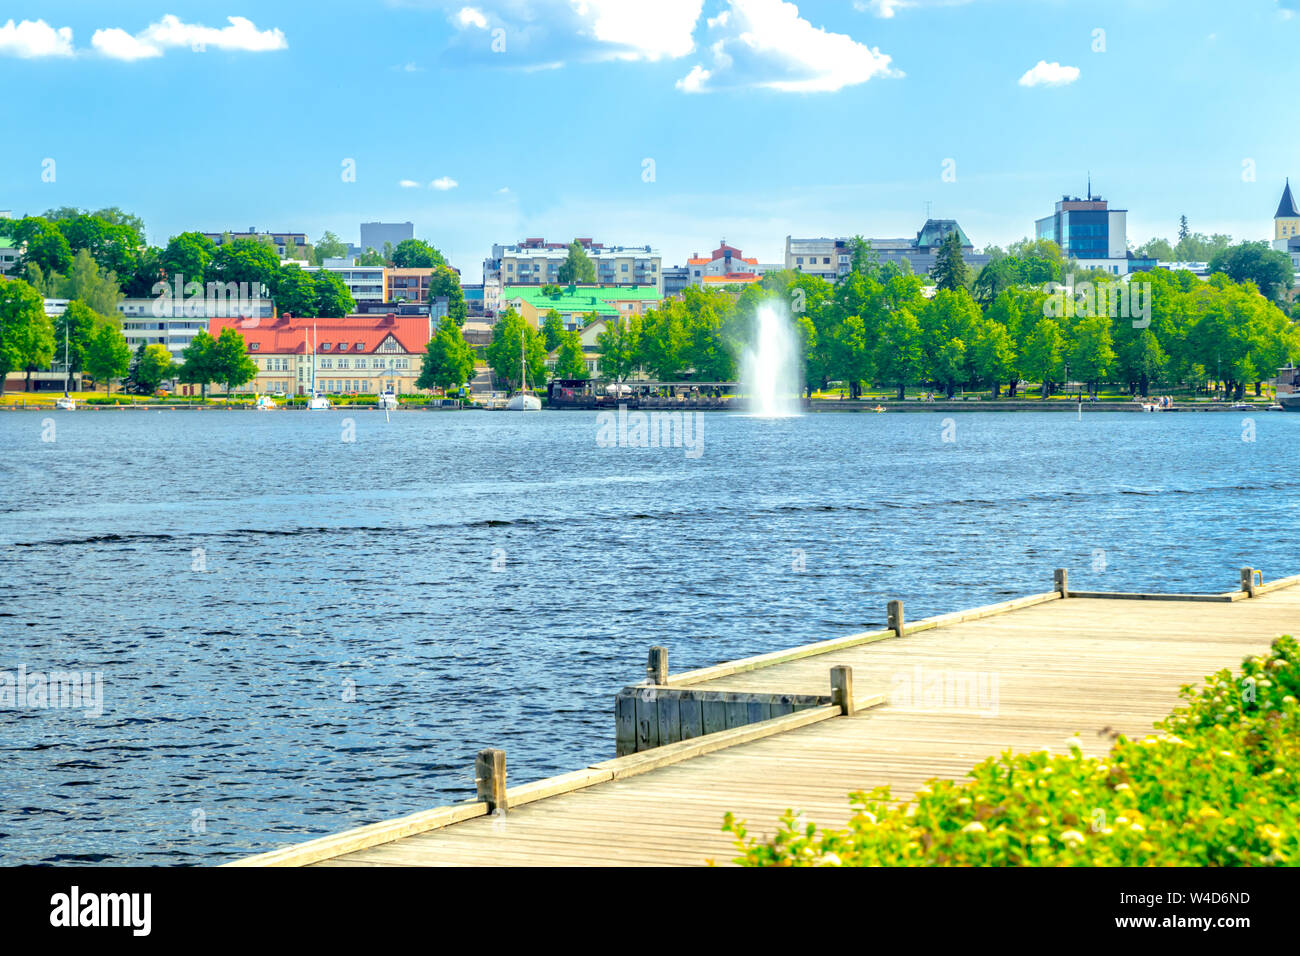 Lappeenranta, Finland - June 20, 2019: Summer landscape with fountain and boats in Lappeenranta harbor on Saimaa lake. Stock Photo